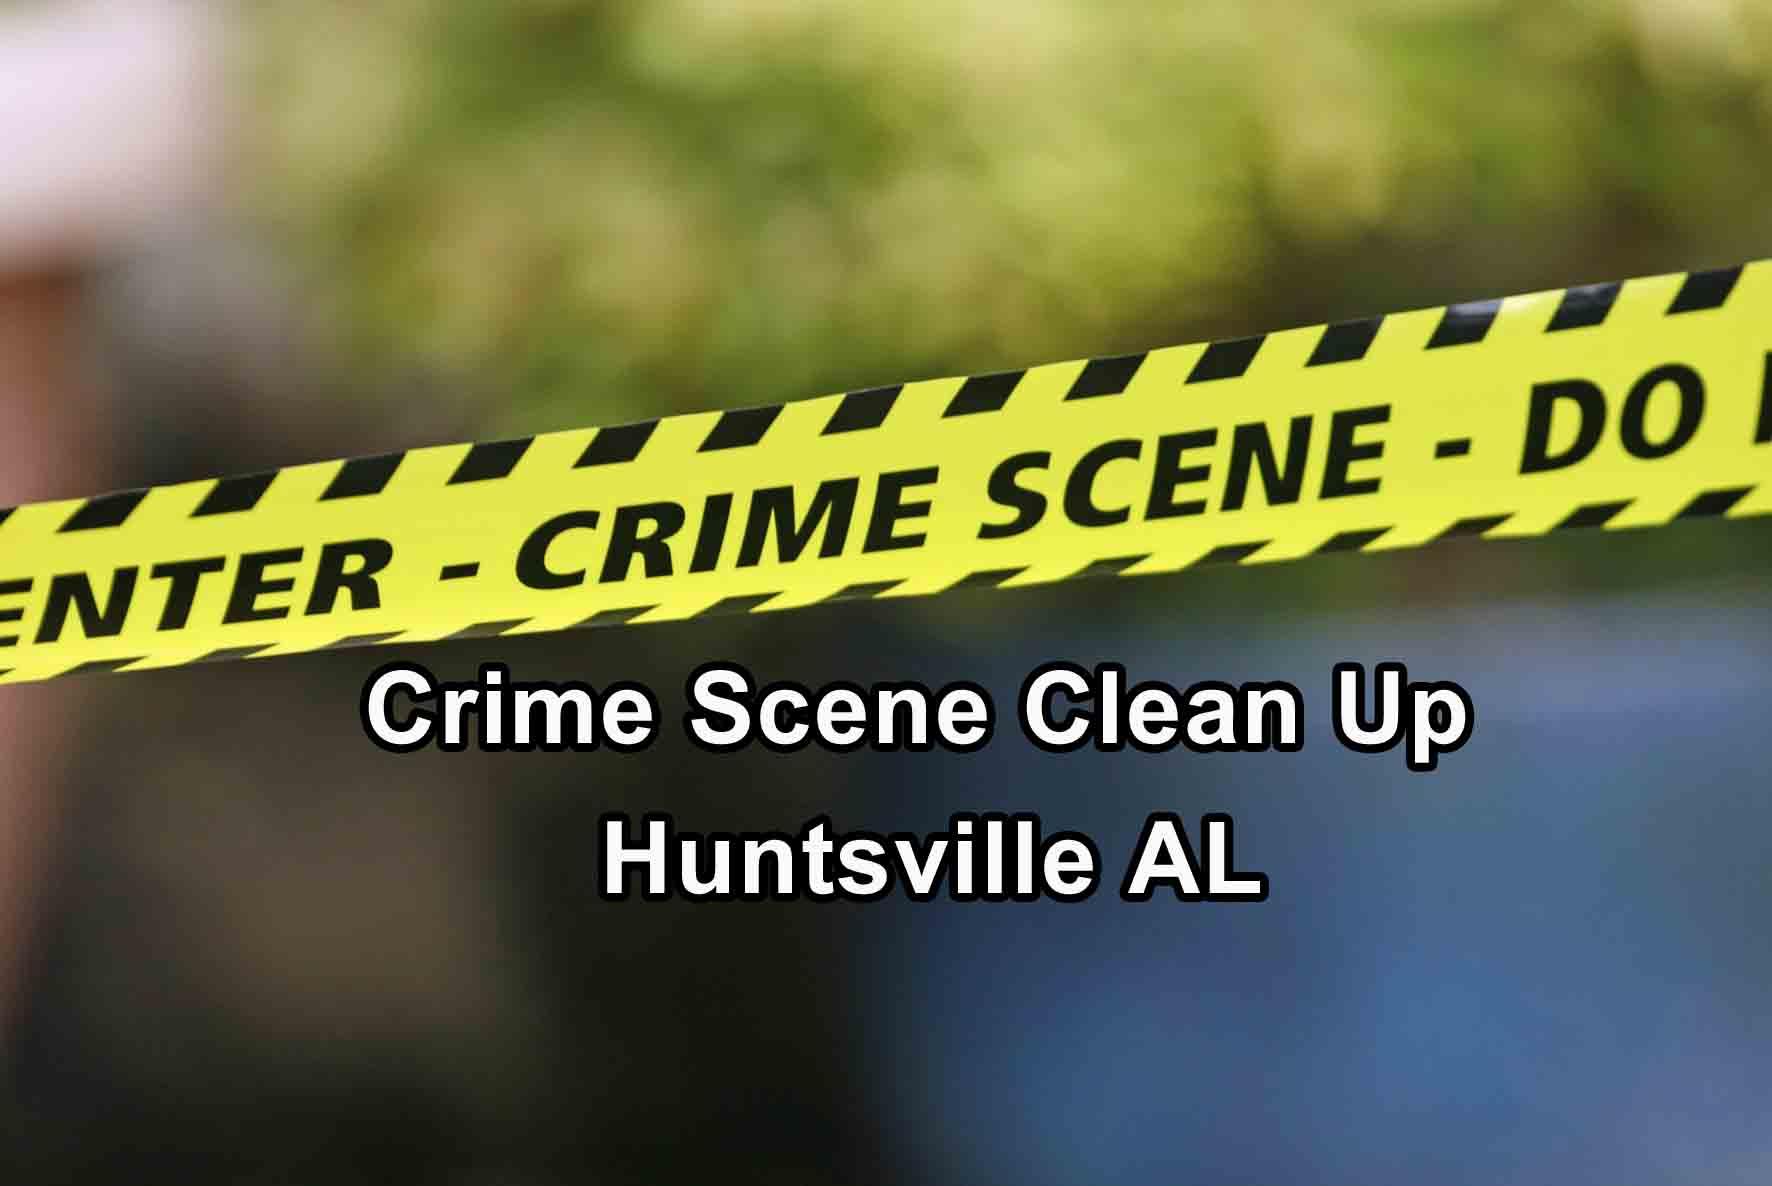 Crime Scene Clean Up - Huntsville AL